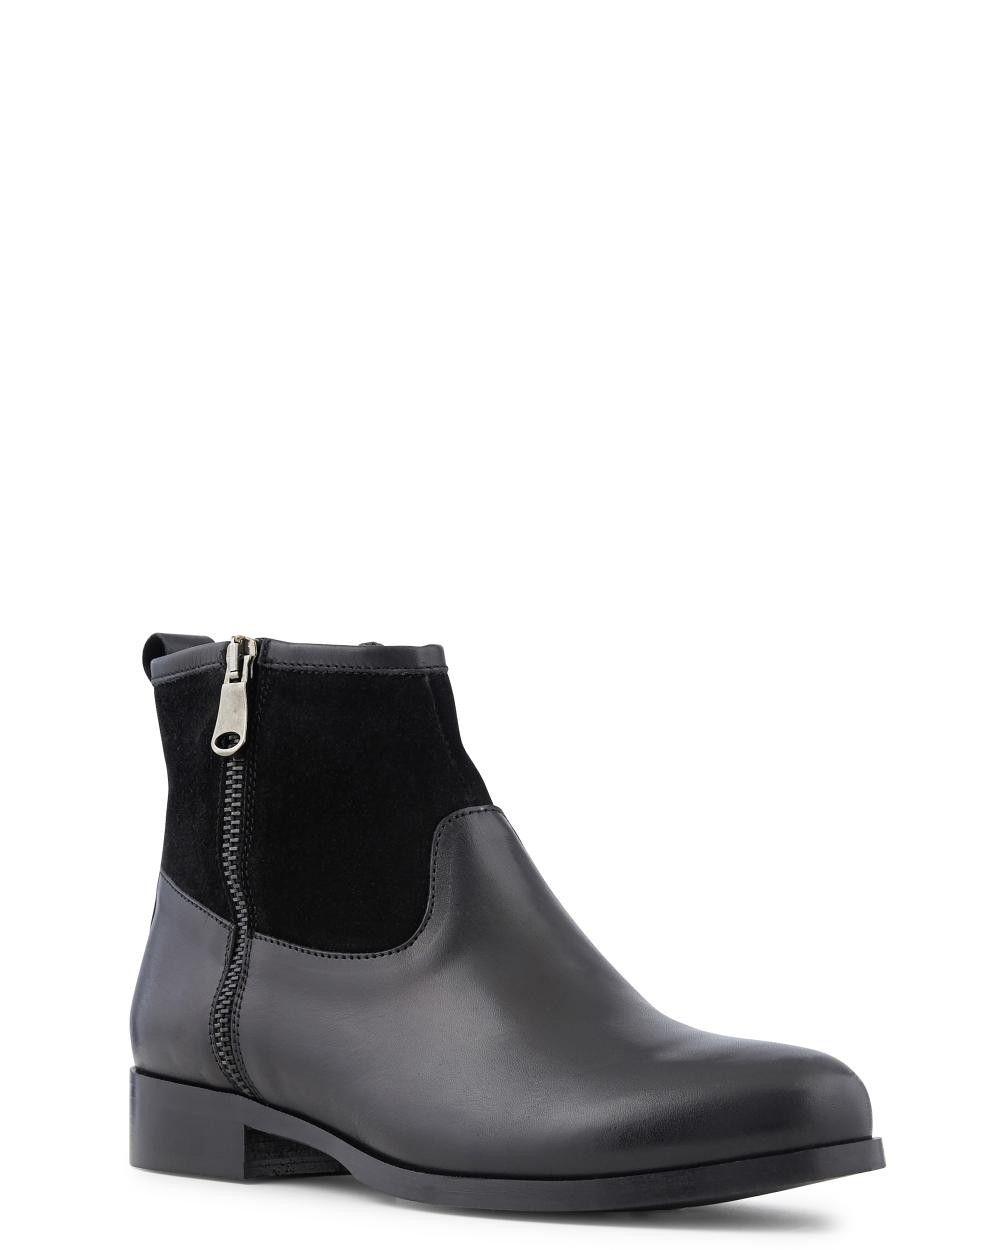 ffe2358a6f4d0 Boots - Barnala Boots Femme Cuir, Bottine Talon, Bottines, Talons, Cuir Noir